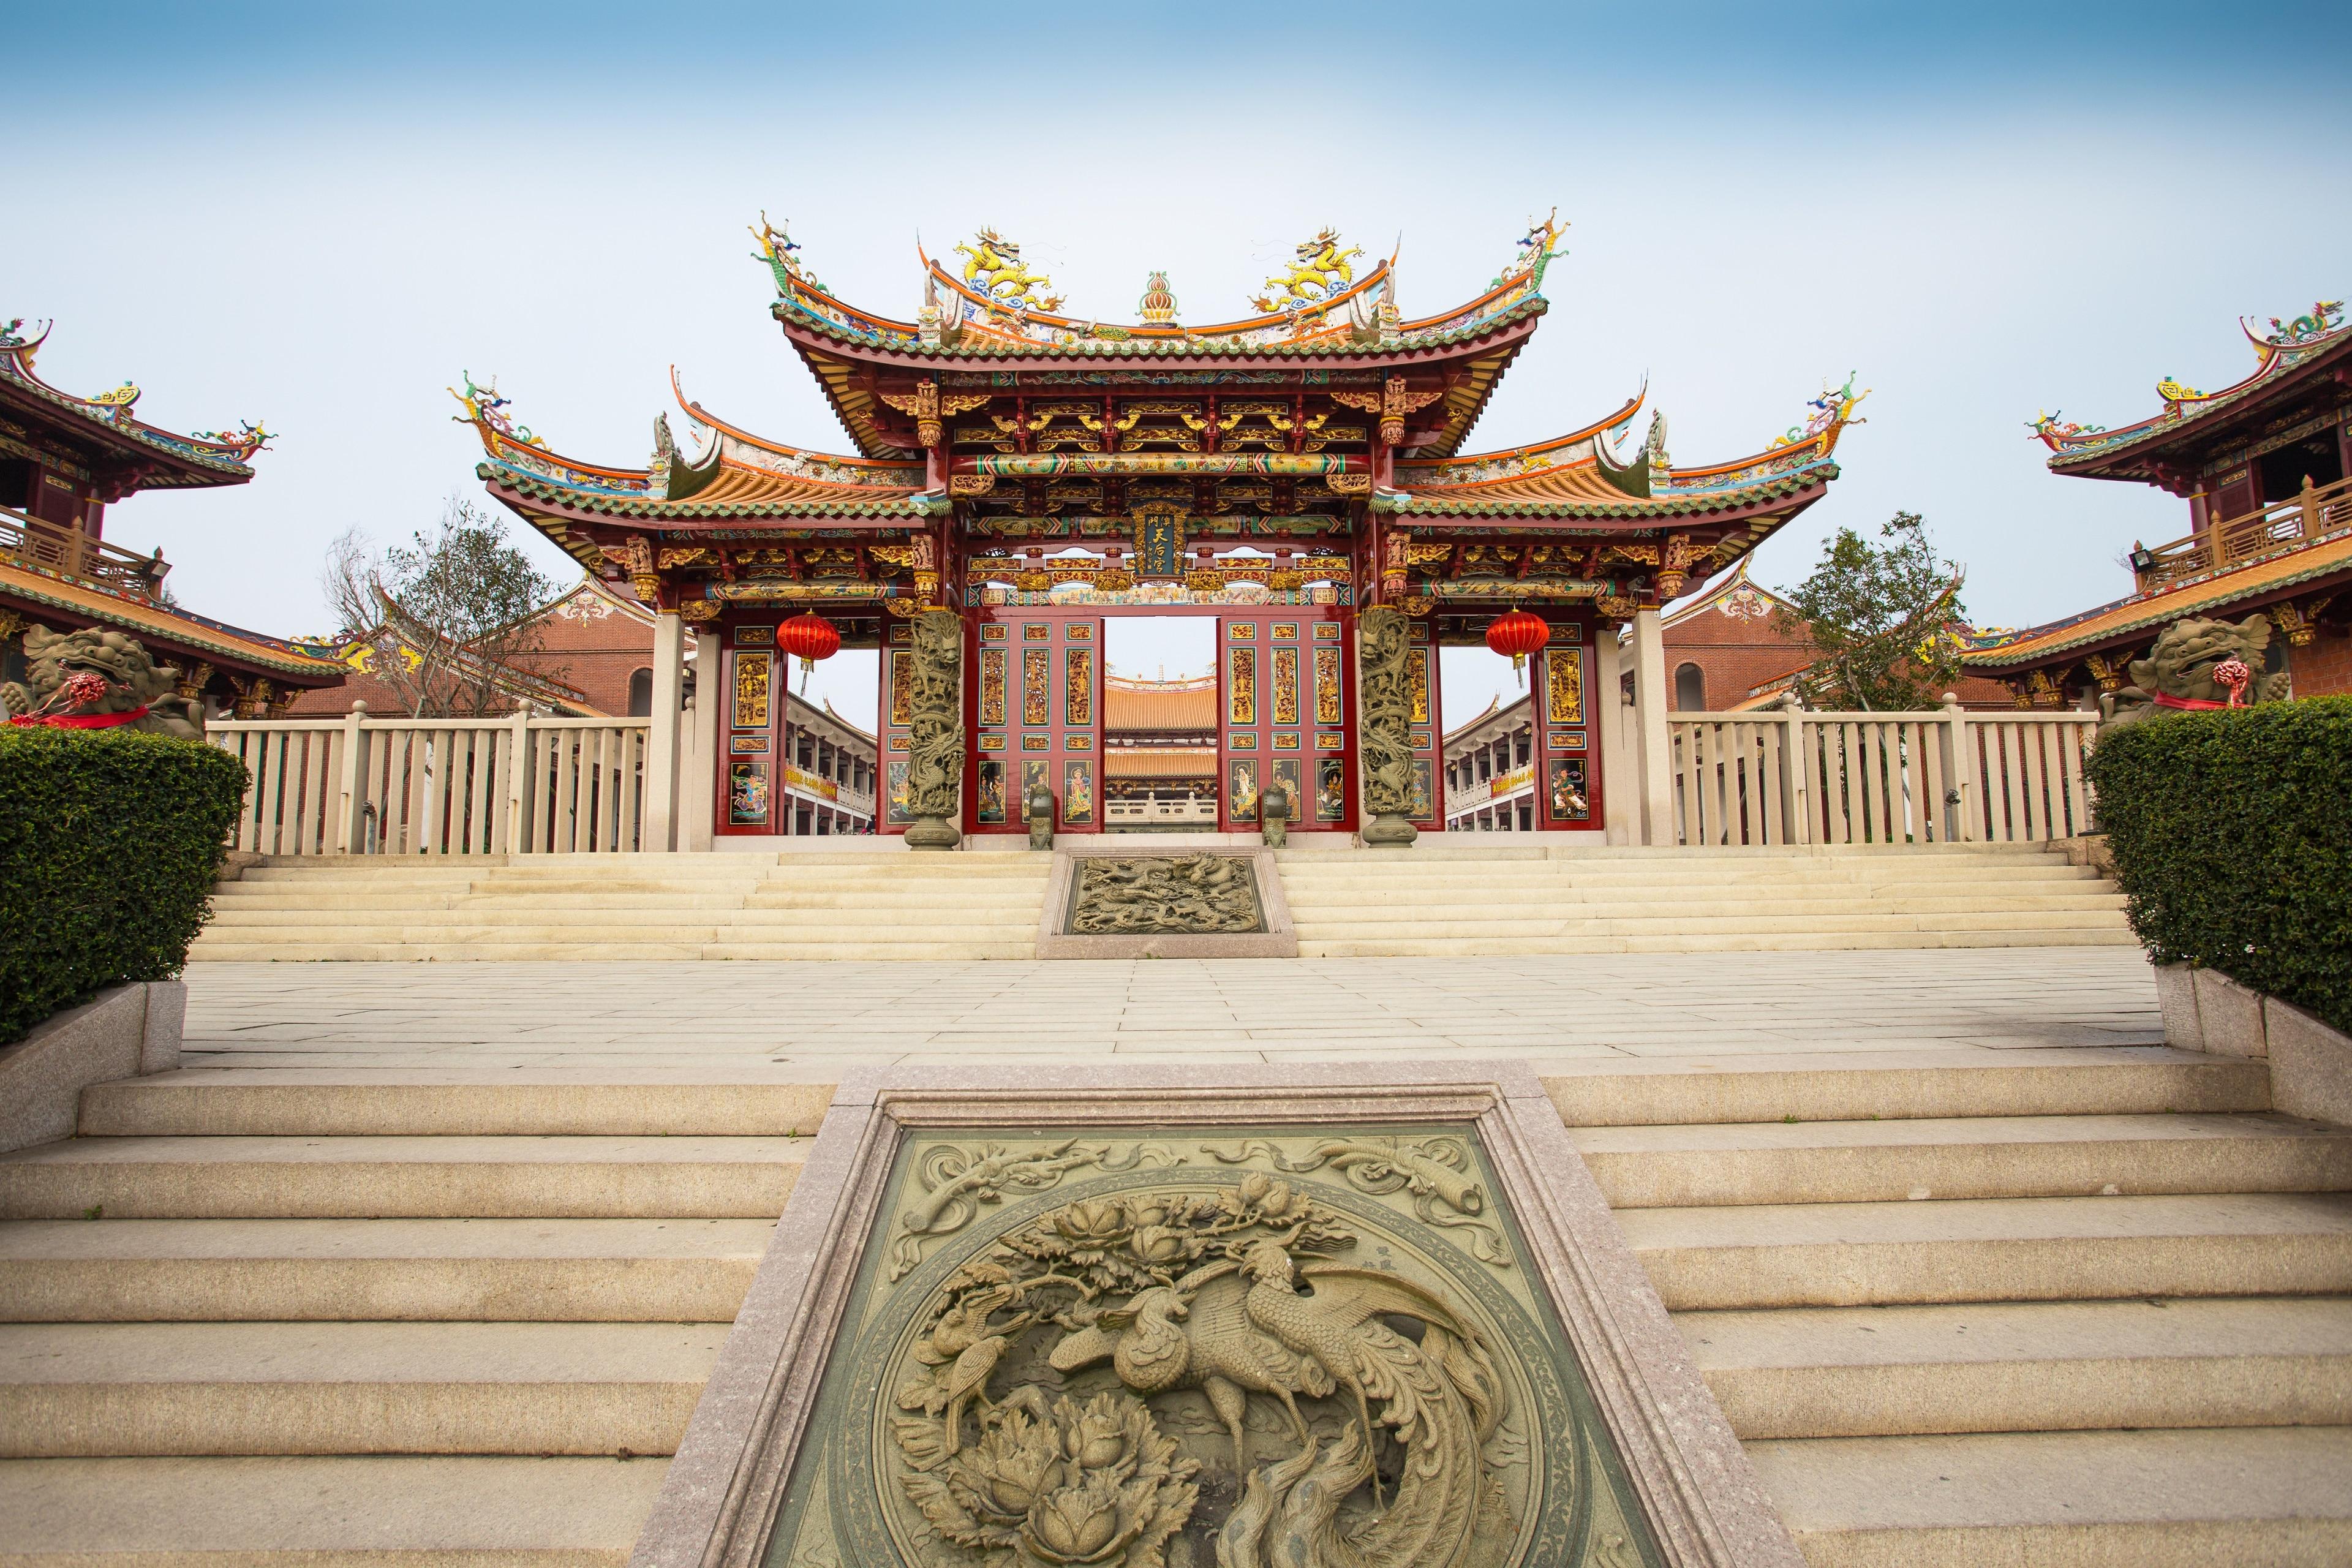 Anda dapat mempelajari sejarah dari Pusat Sejarah Macau dengan mengunjungi Kuil A-Ma. Kunjungi kasino dan toko di area kaya budaya ini.